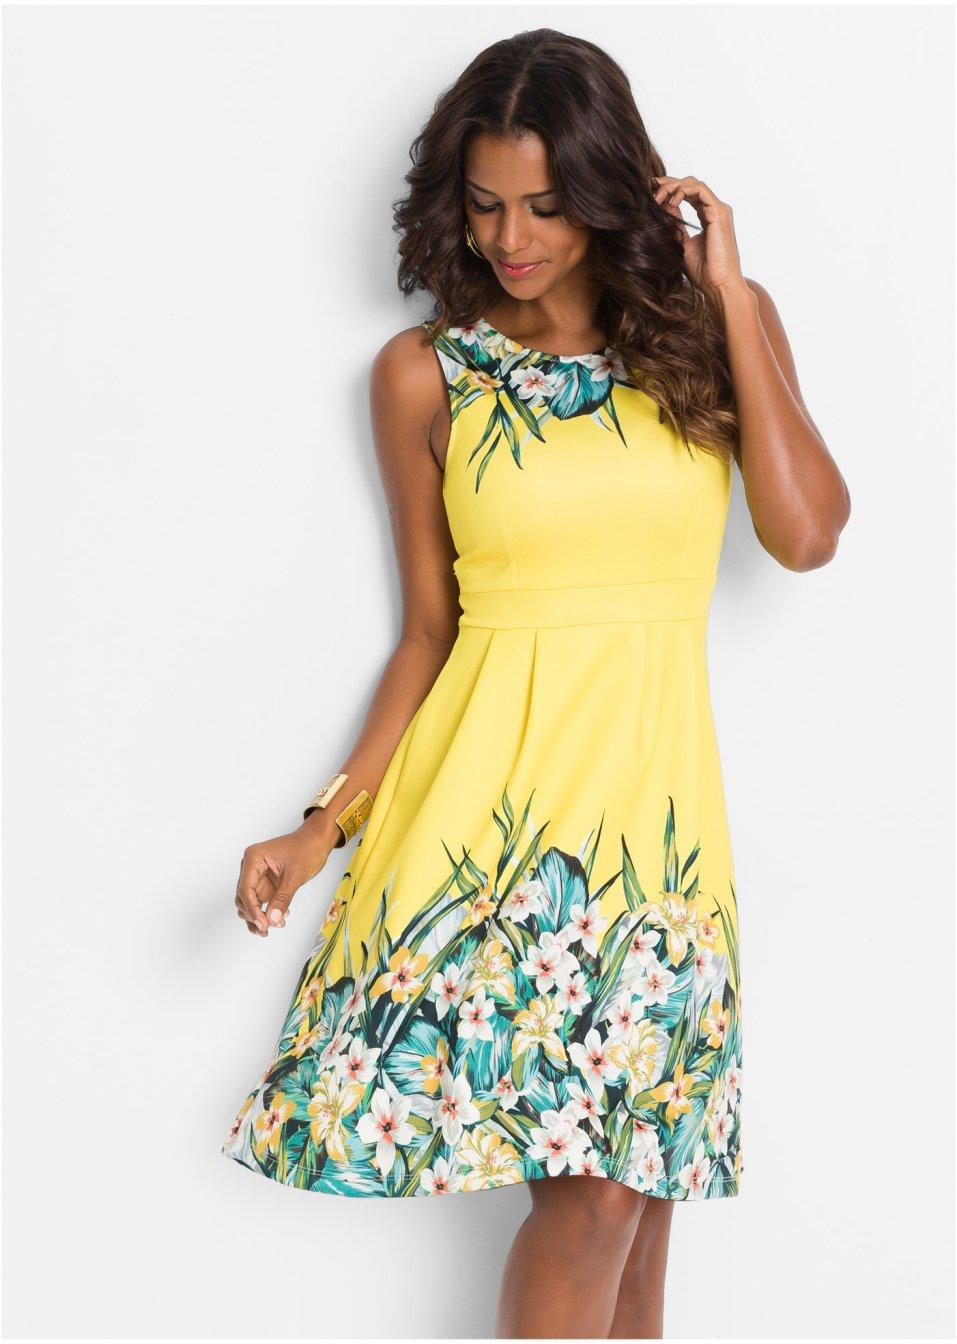 Kleid mit Blumenprint gelb/grün geblümt - BODYFLIRT ...